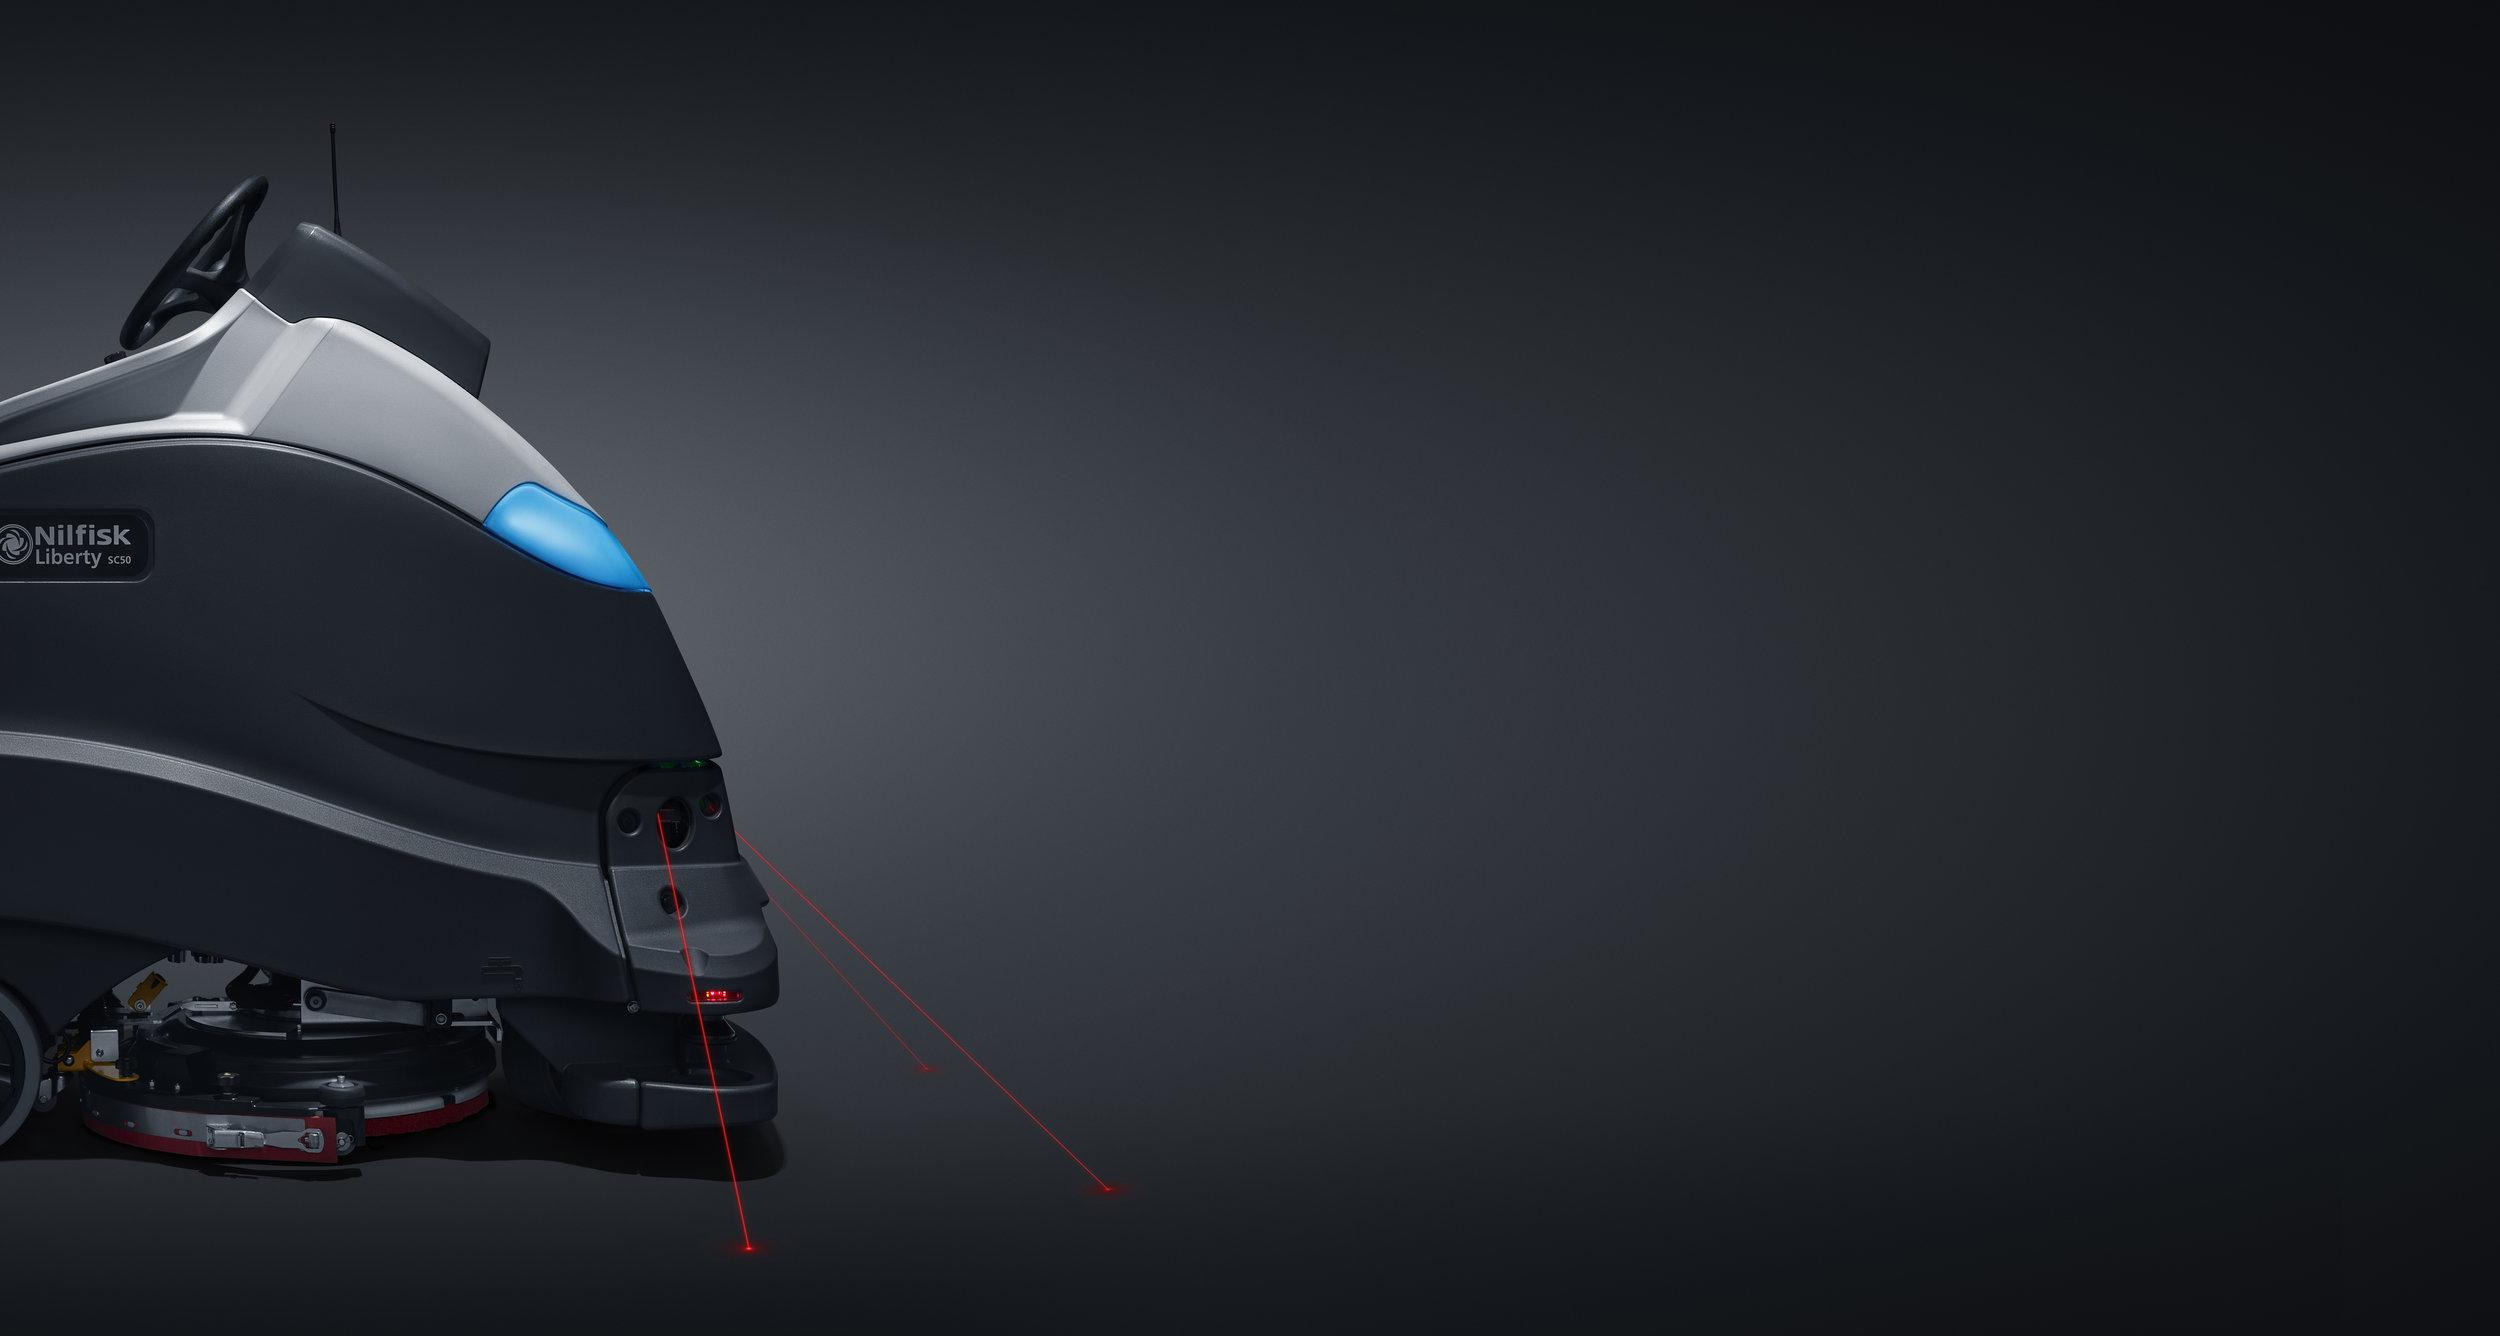 Liberty SC50 laser crop.jpg